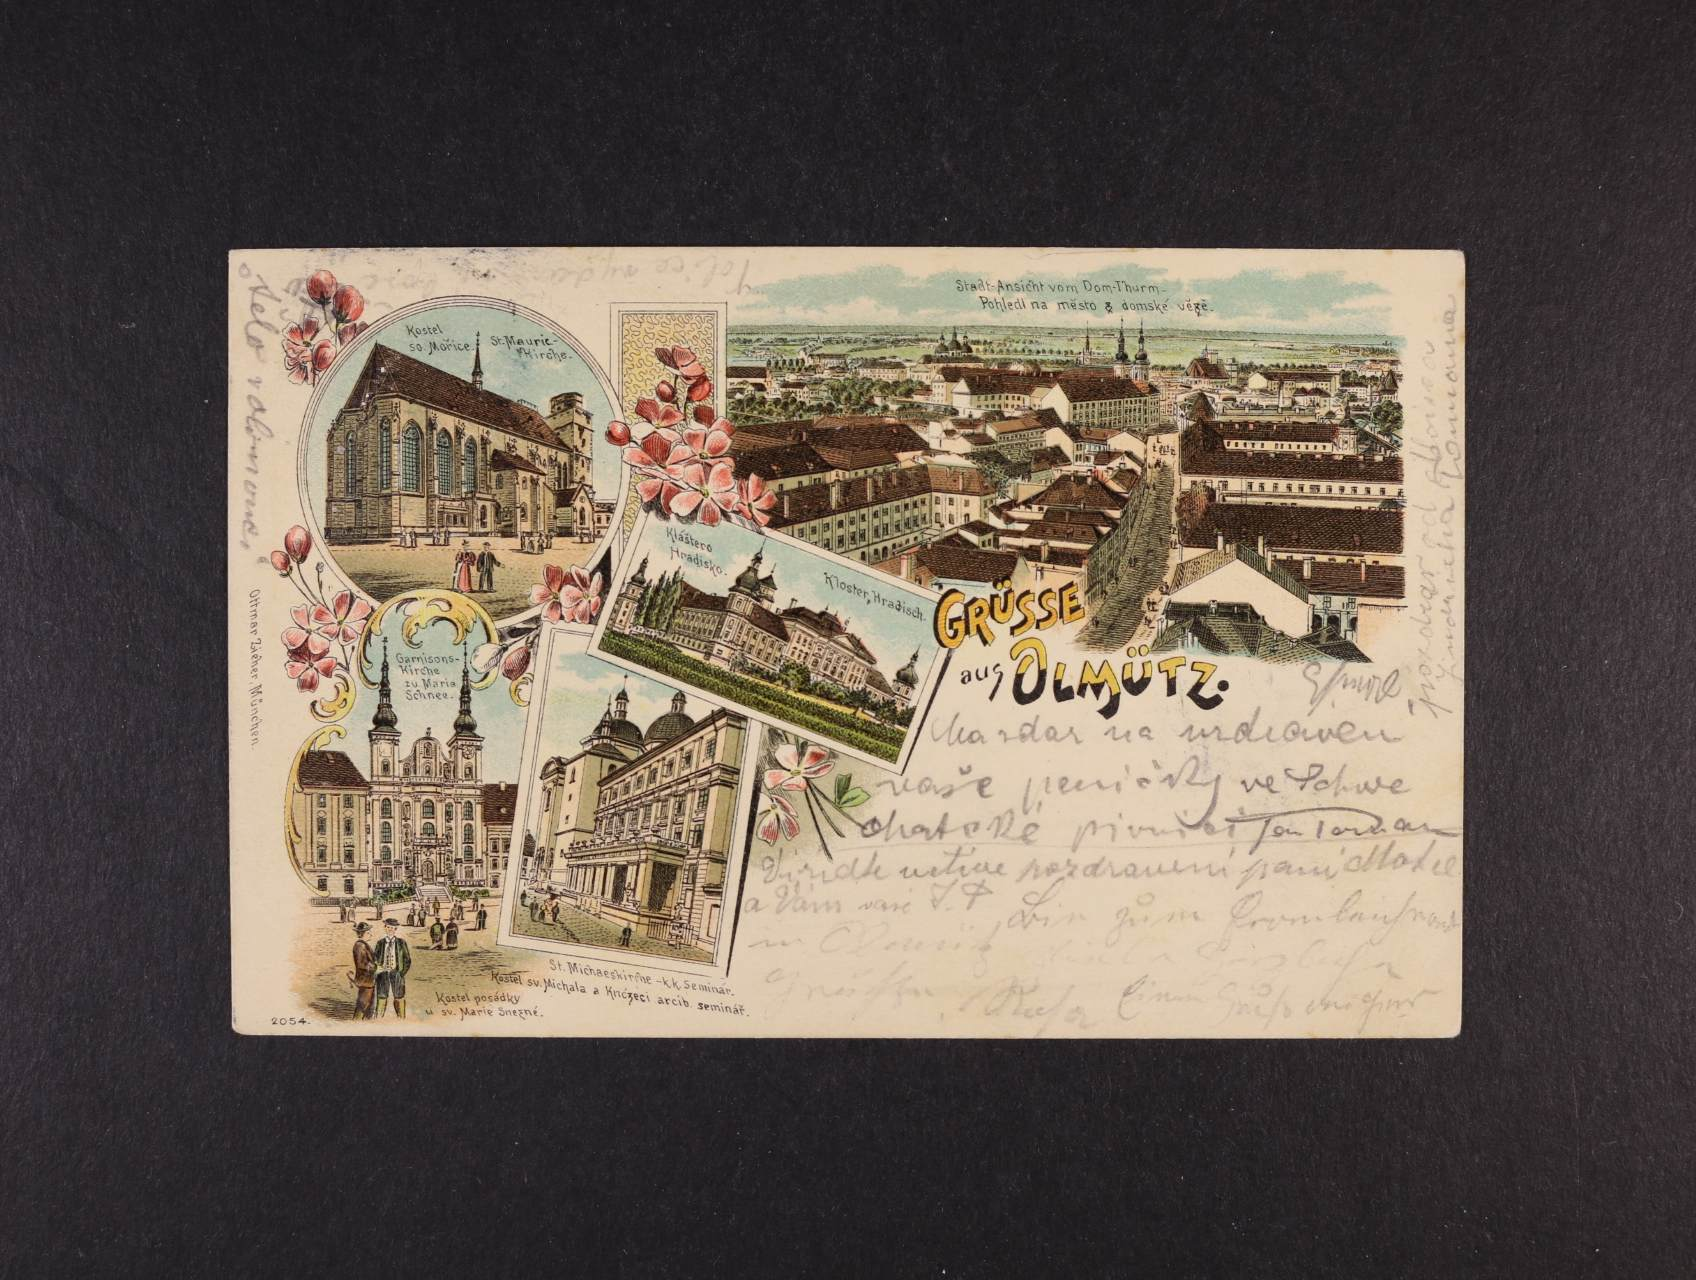 Olomouc - bar. litograf. koláž, dl. adresa, použitá 1898